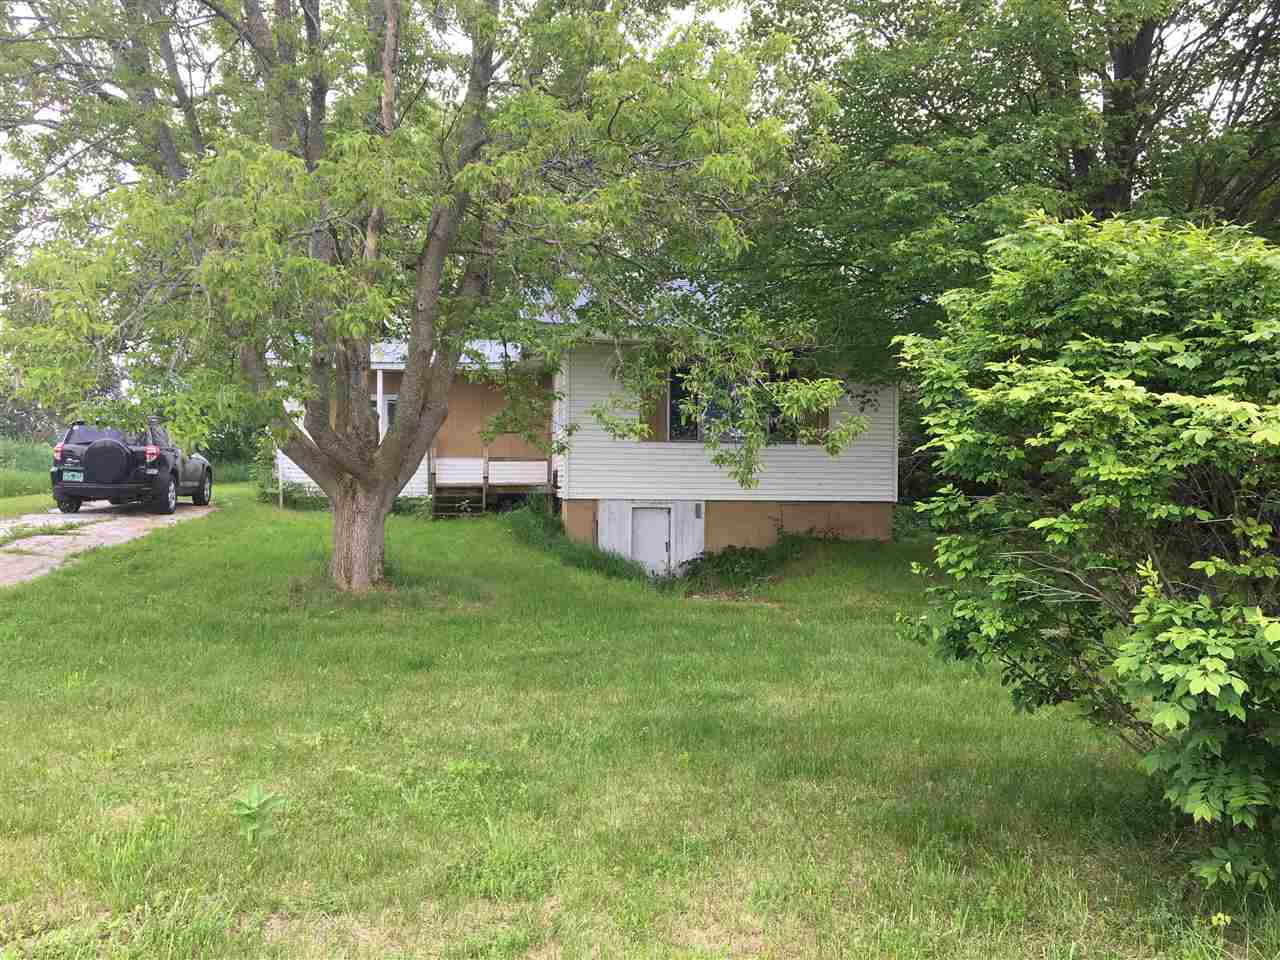 193 Lakewood Drive, Swanton, VT 05488